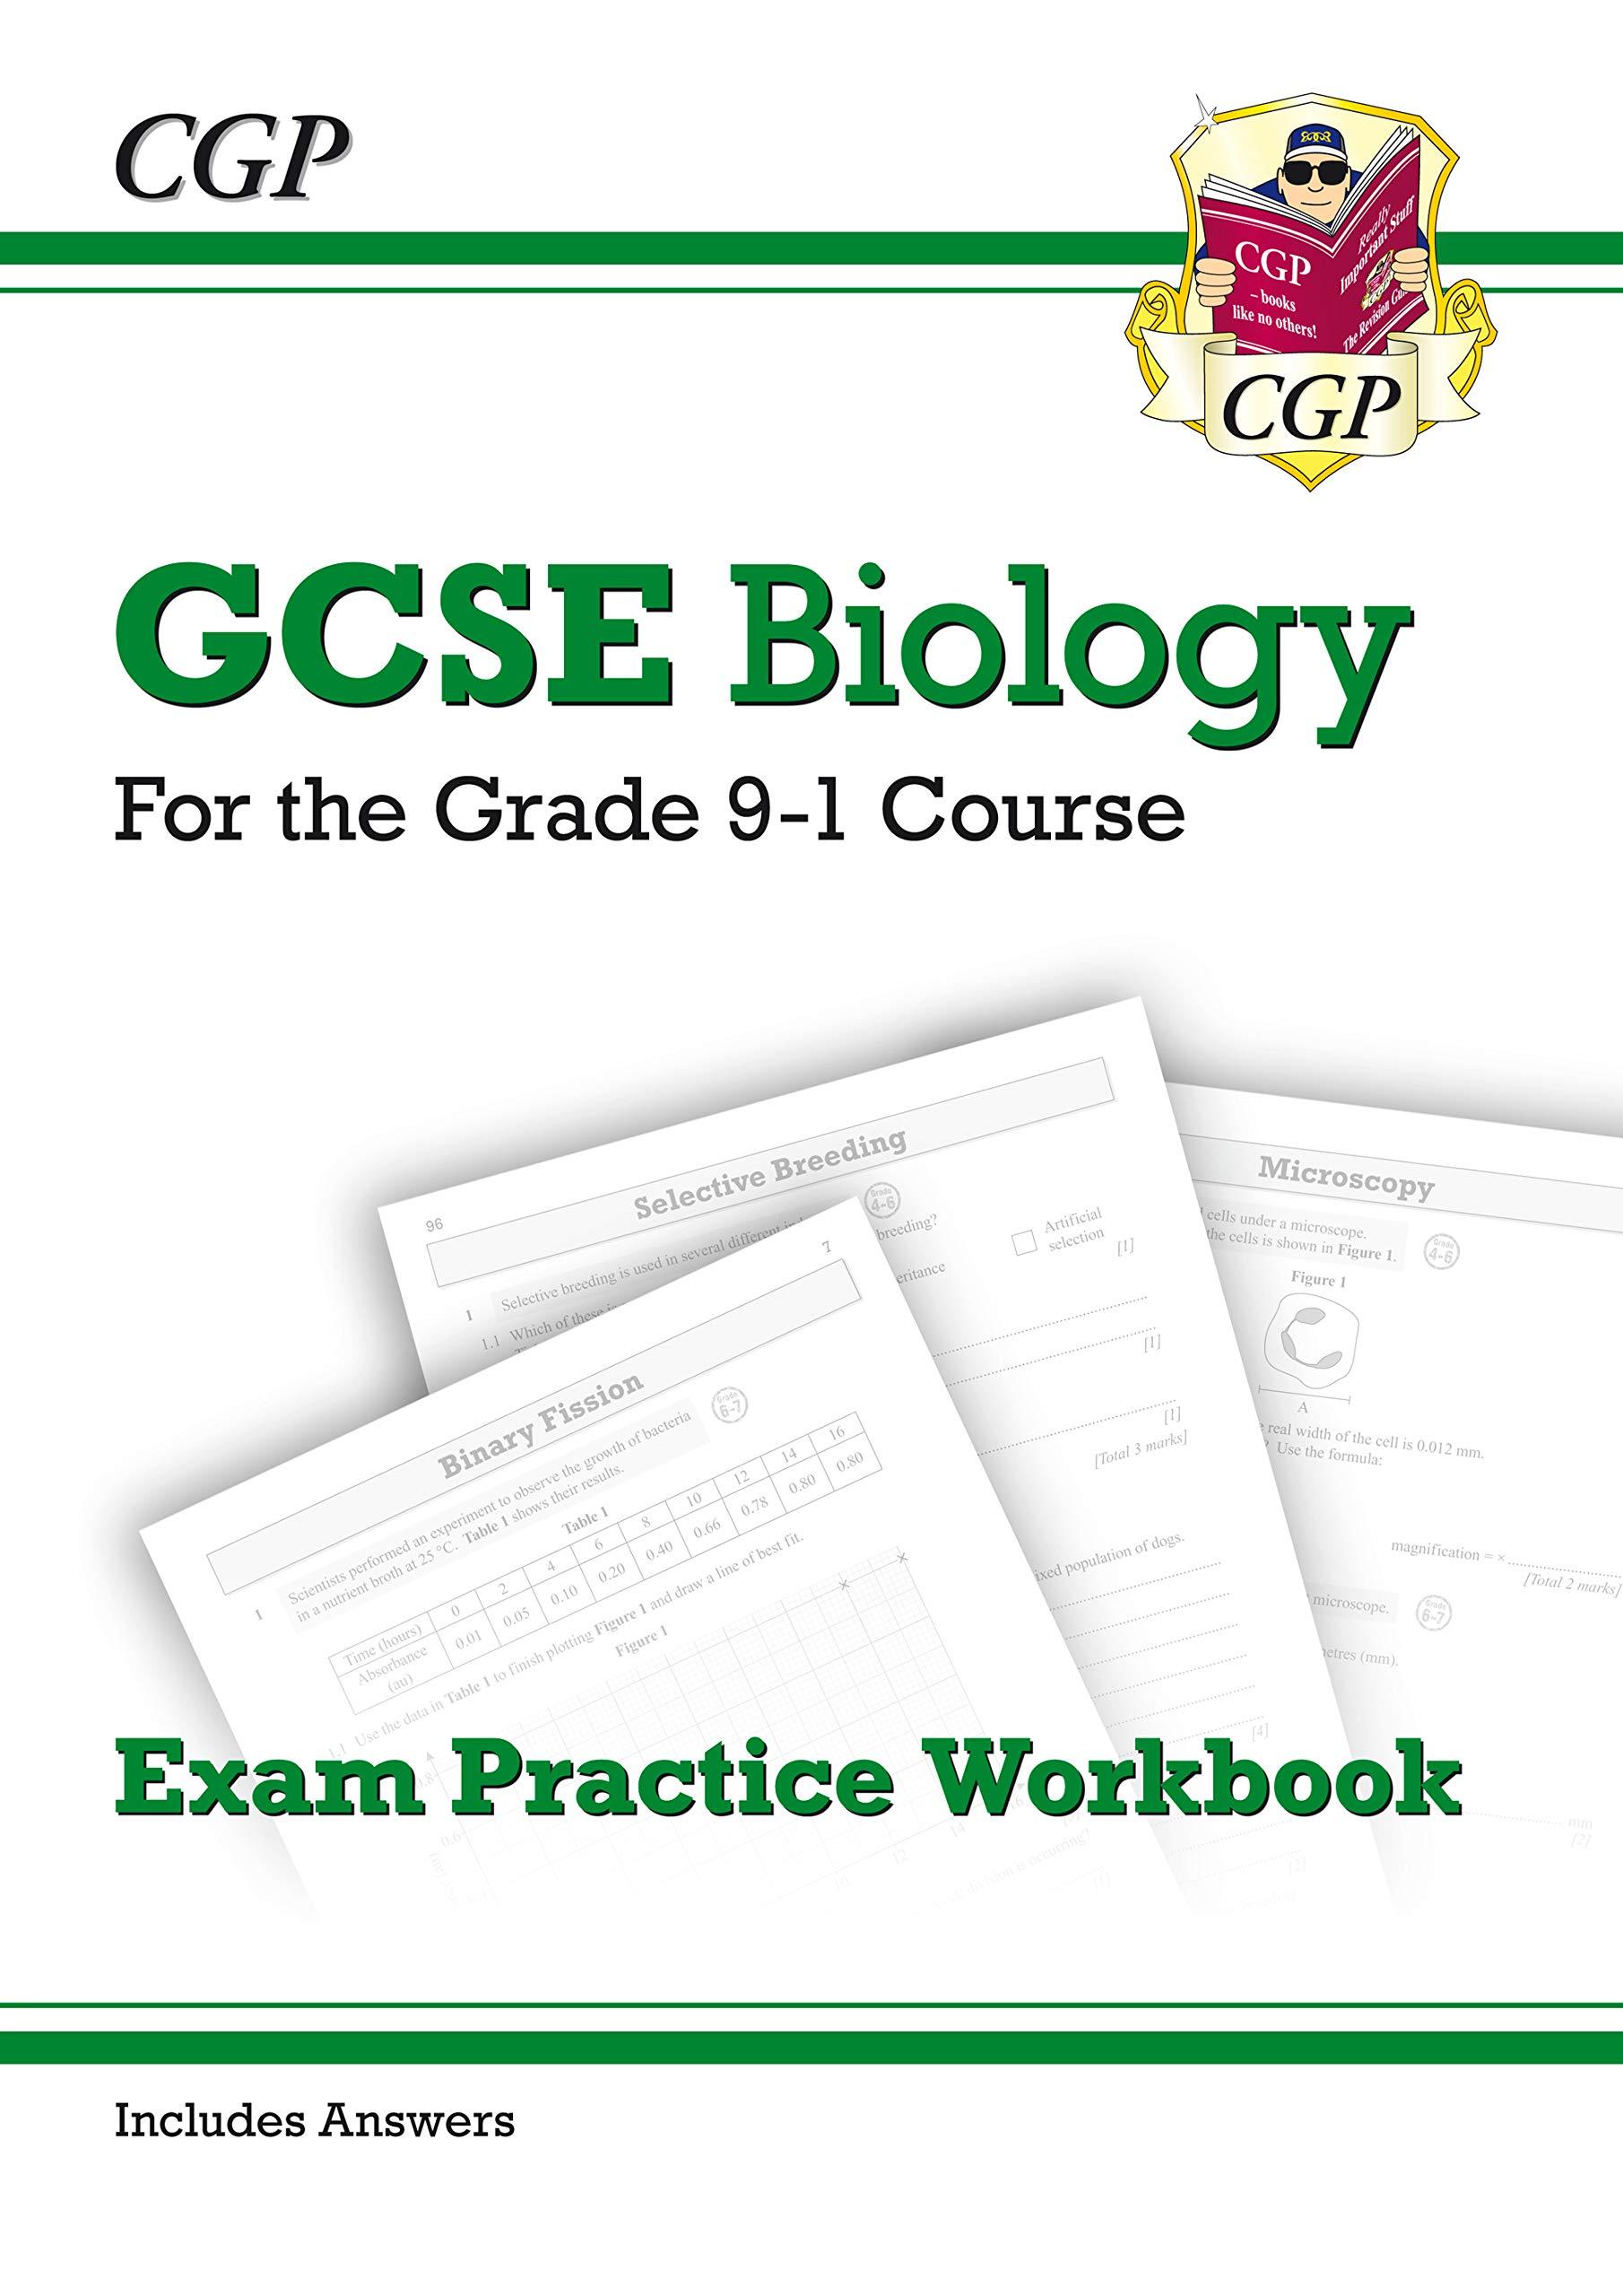 Grade 9-1 GCSE Biology: Exam Practice Workbook (with answers